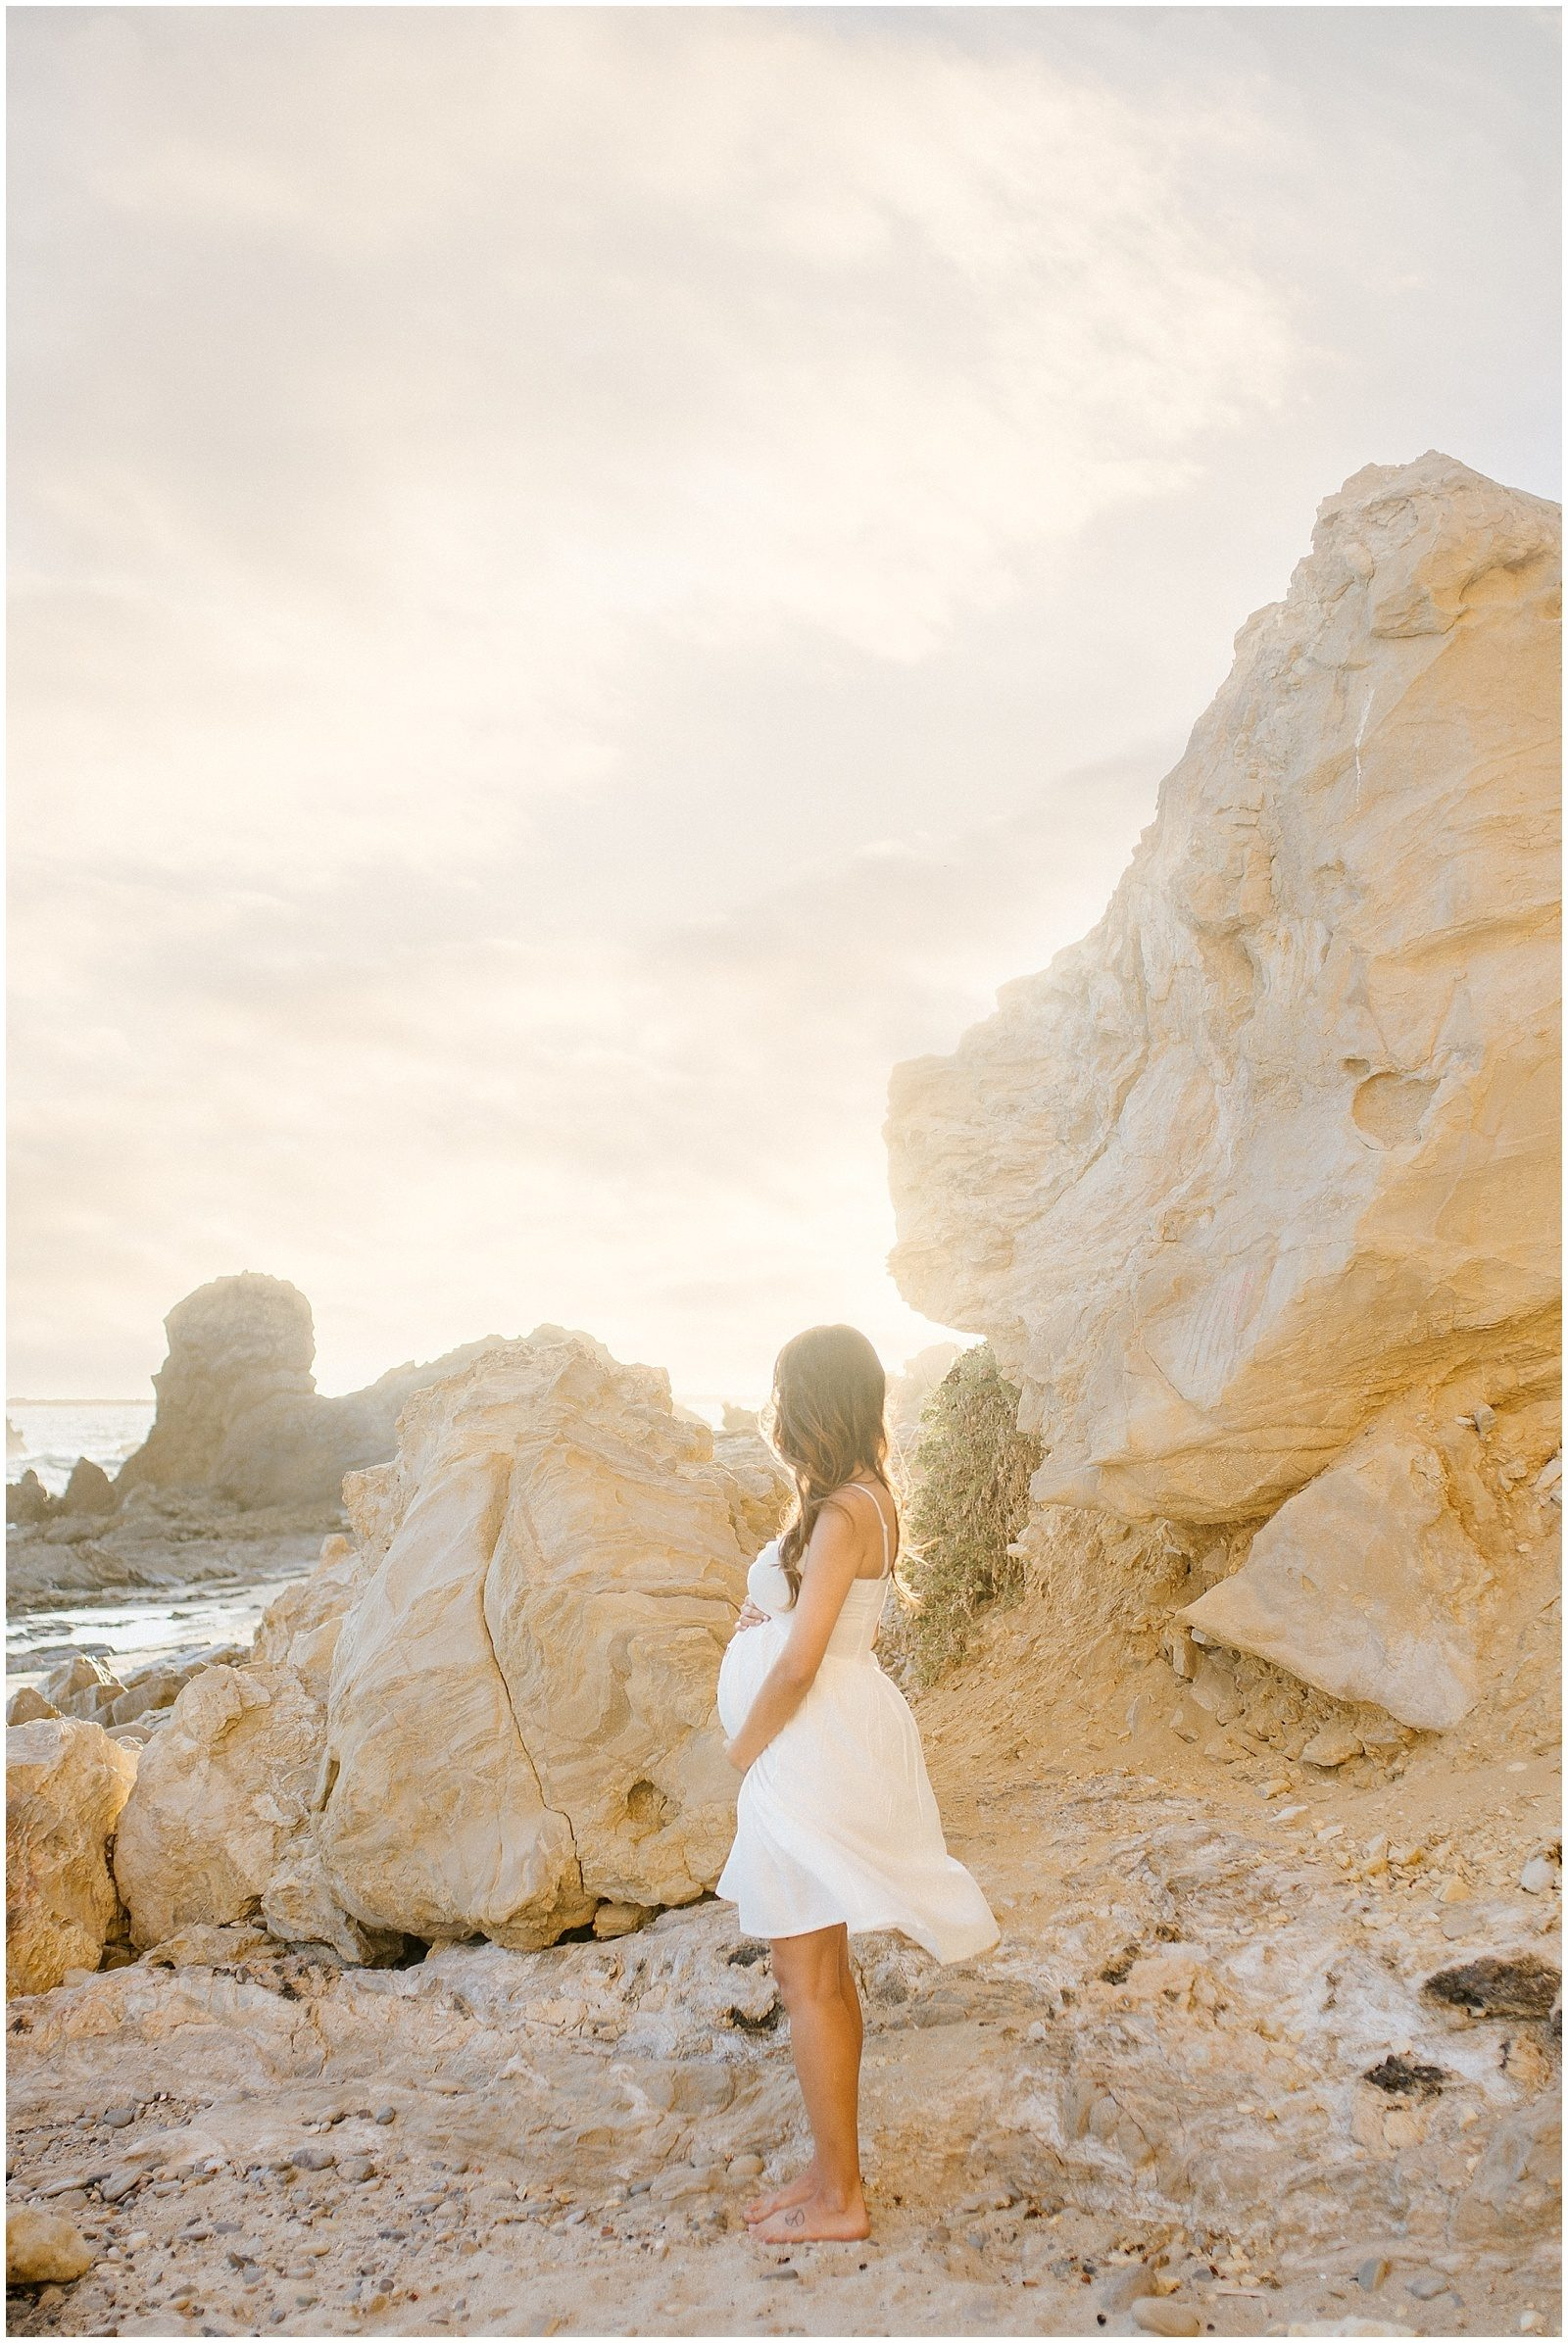 Seaside Maternity Session | Orange County Maternity Photographer